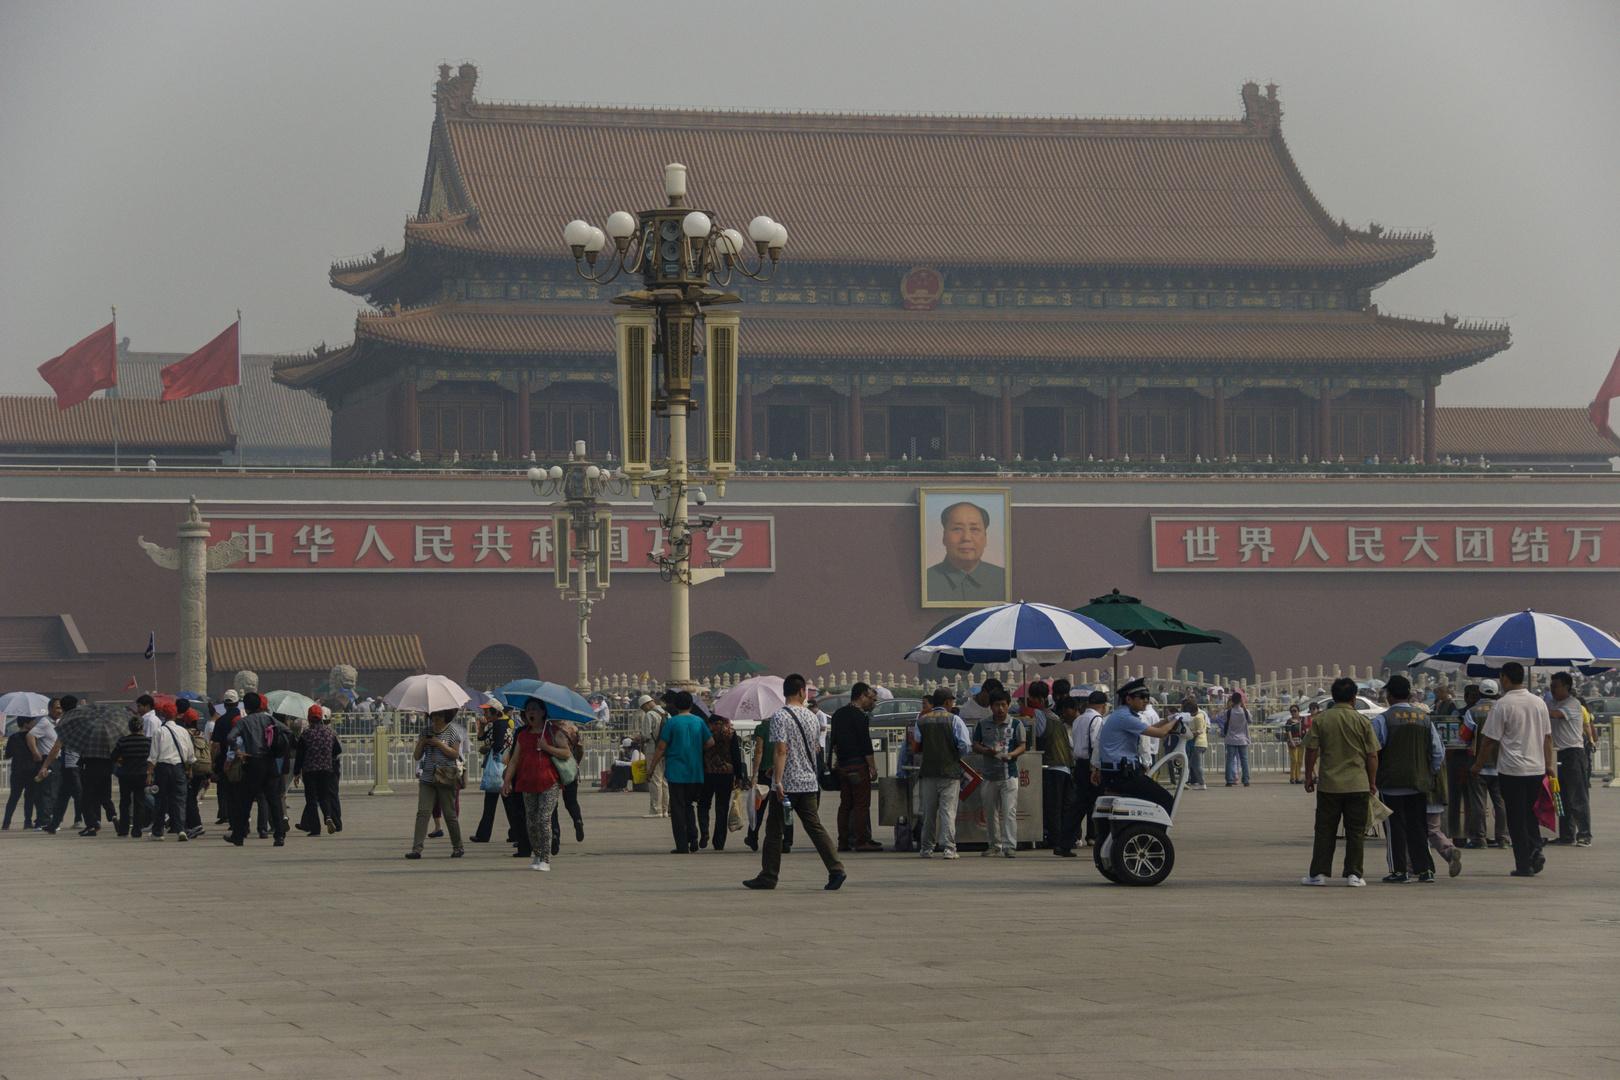 041 - Beijing - Tiananmen Square - Tiananmen Gate Tower to the Forbidden City